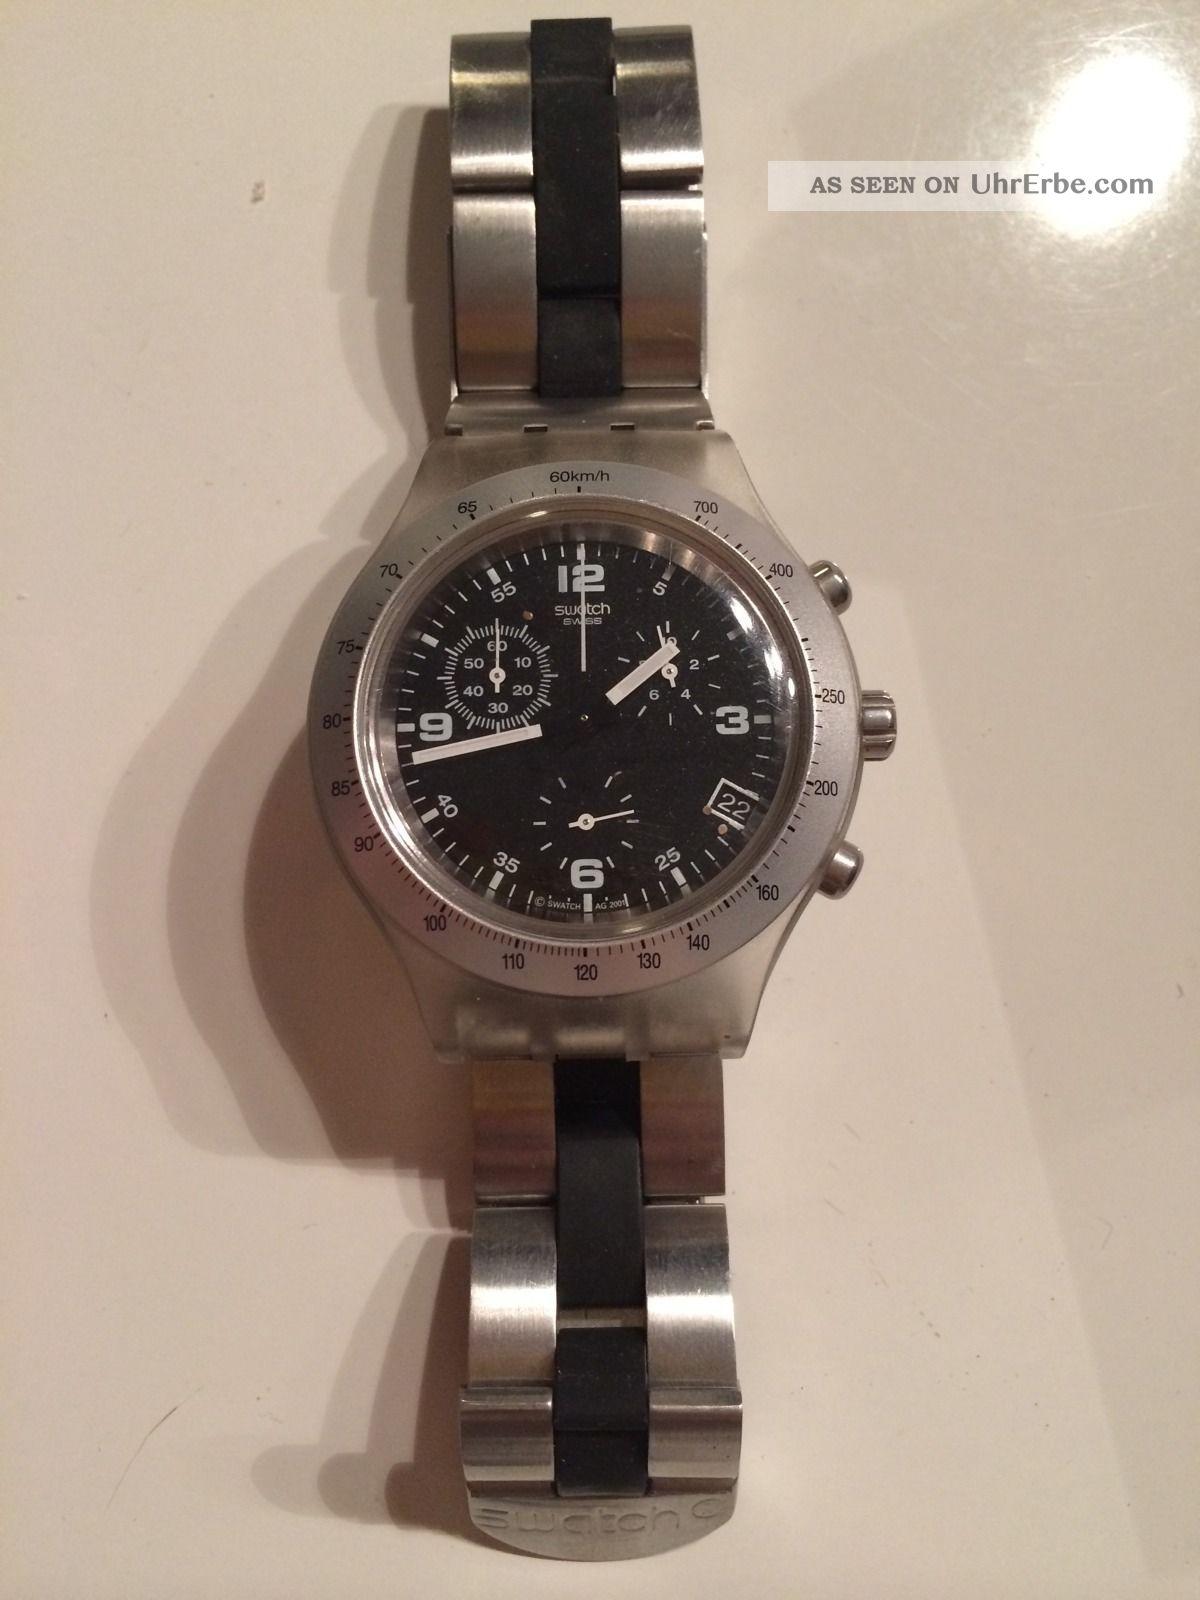 Swarch Chronograph Armbanduhren Bild